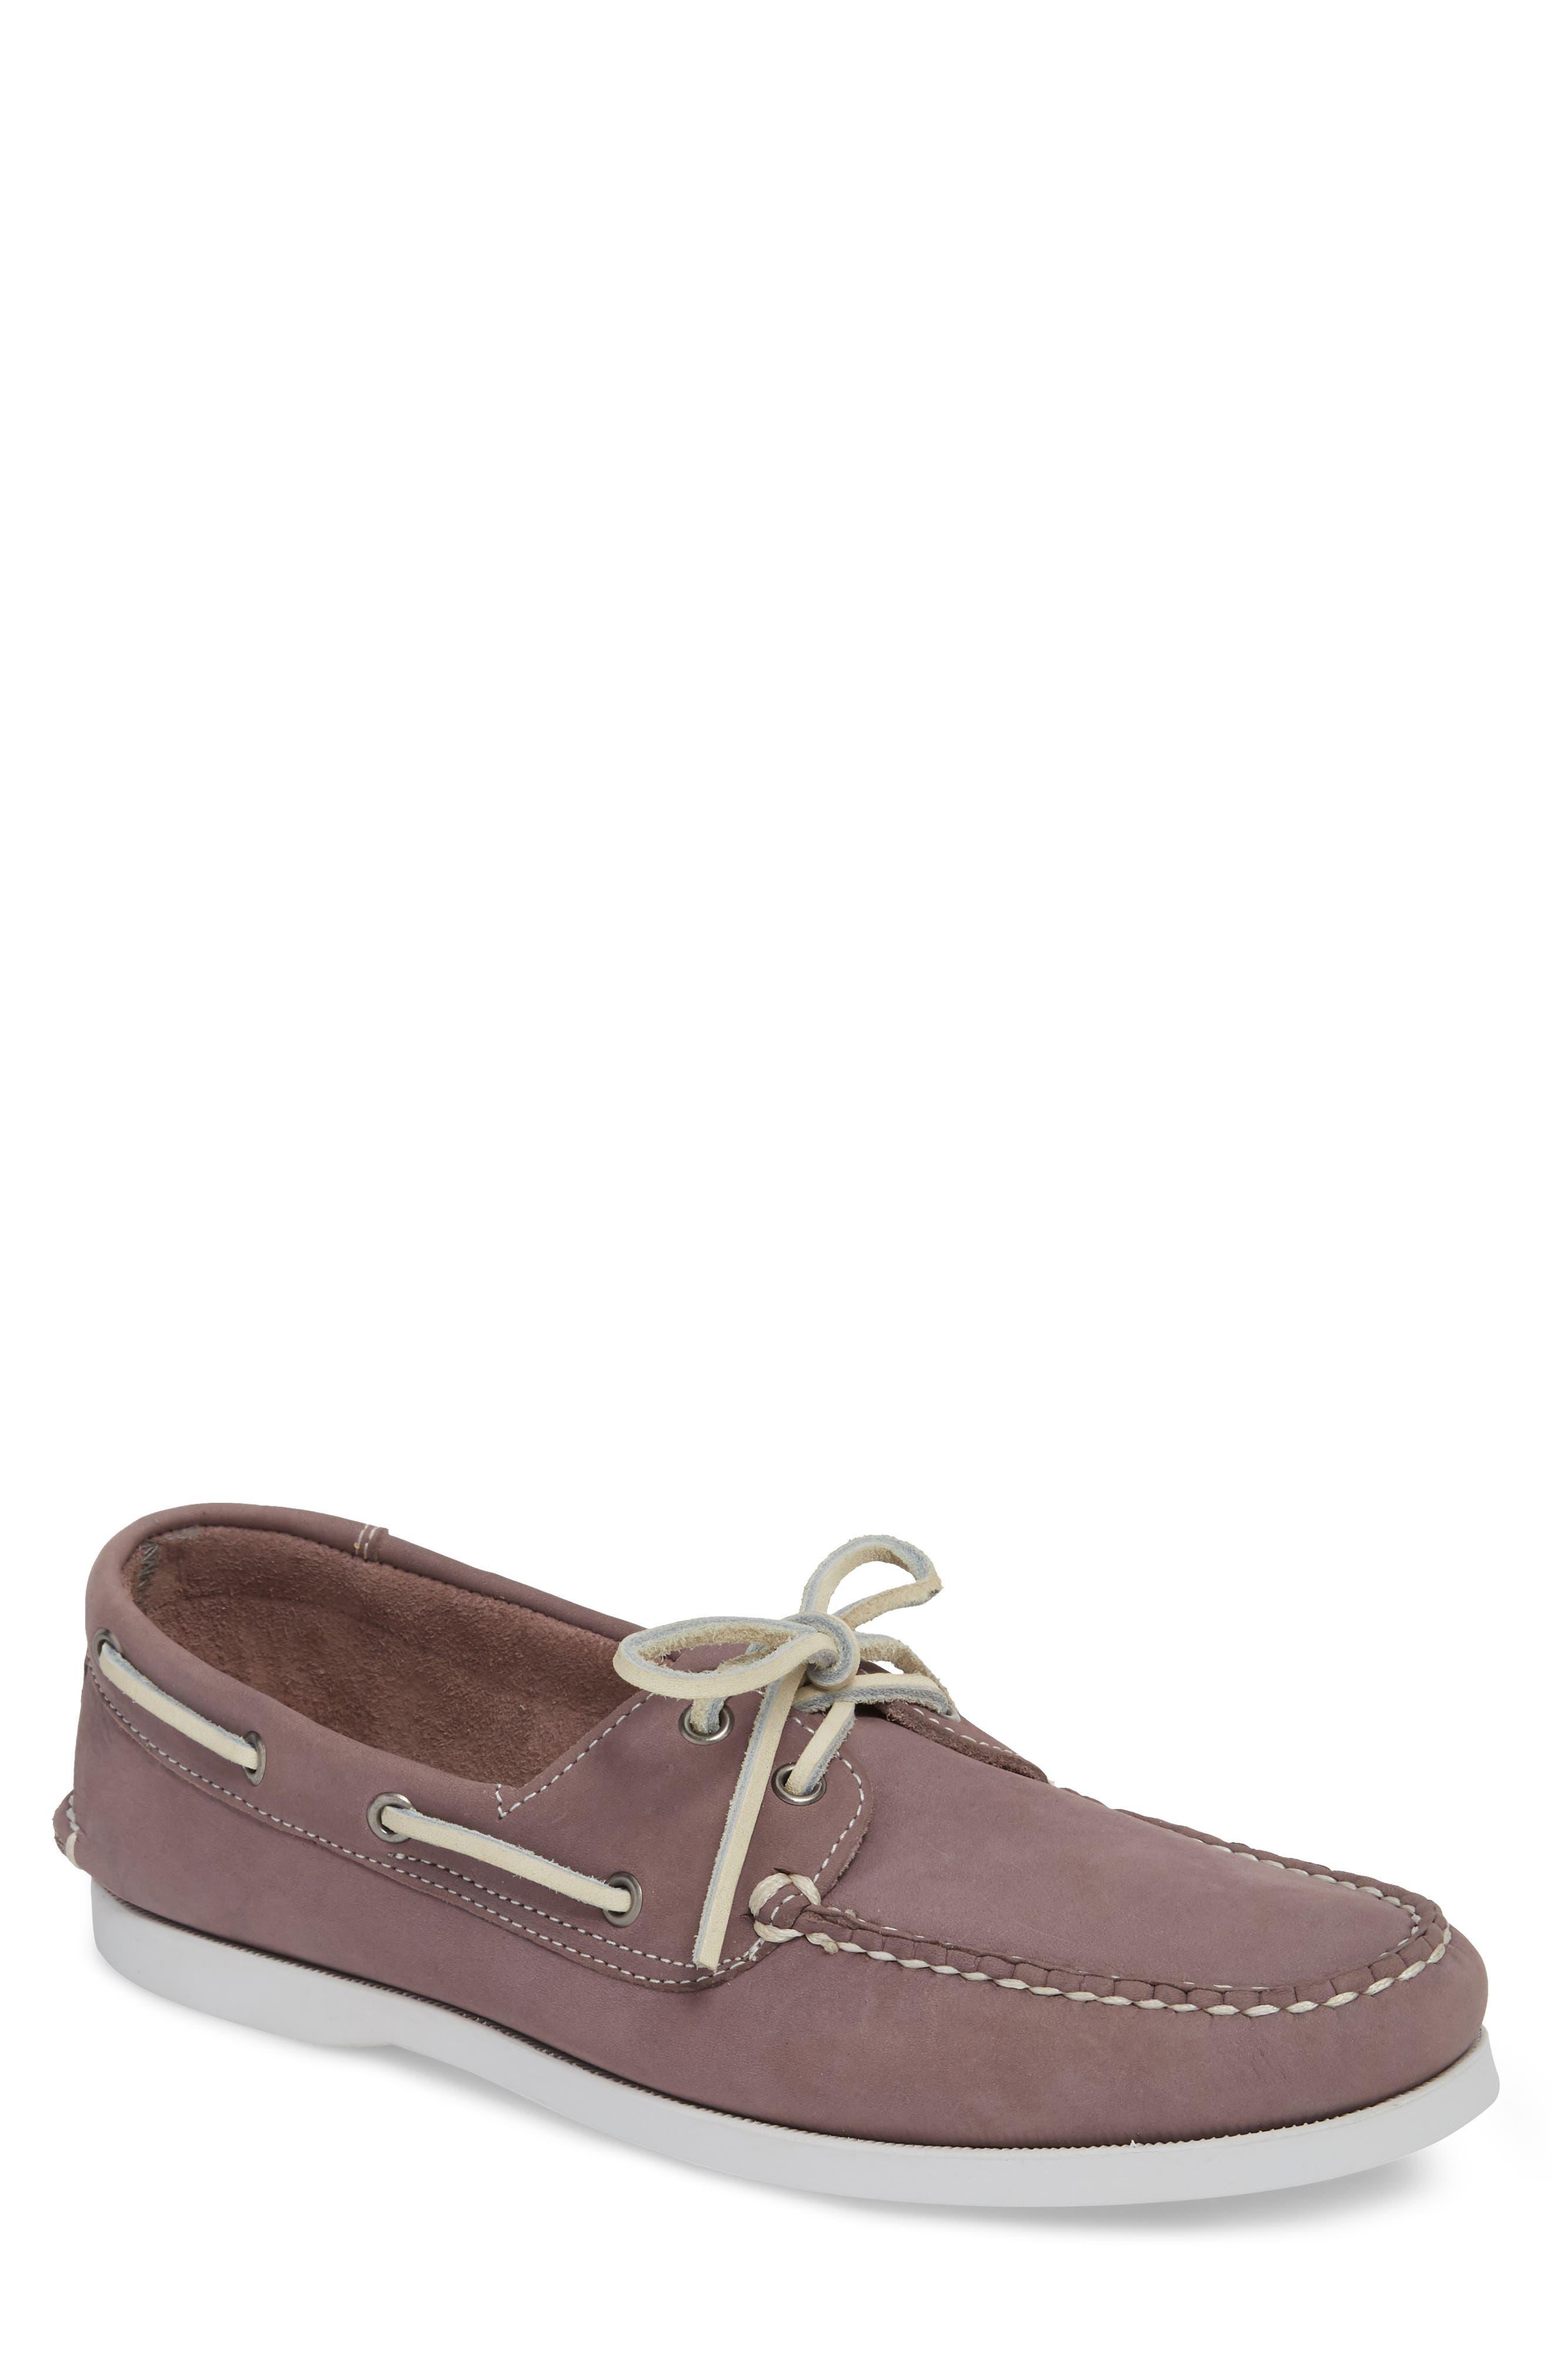 Pacific Boat Shoe,                             Main thumbnail 1, color,                             Lavender Nubuck